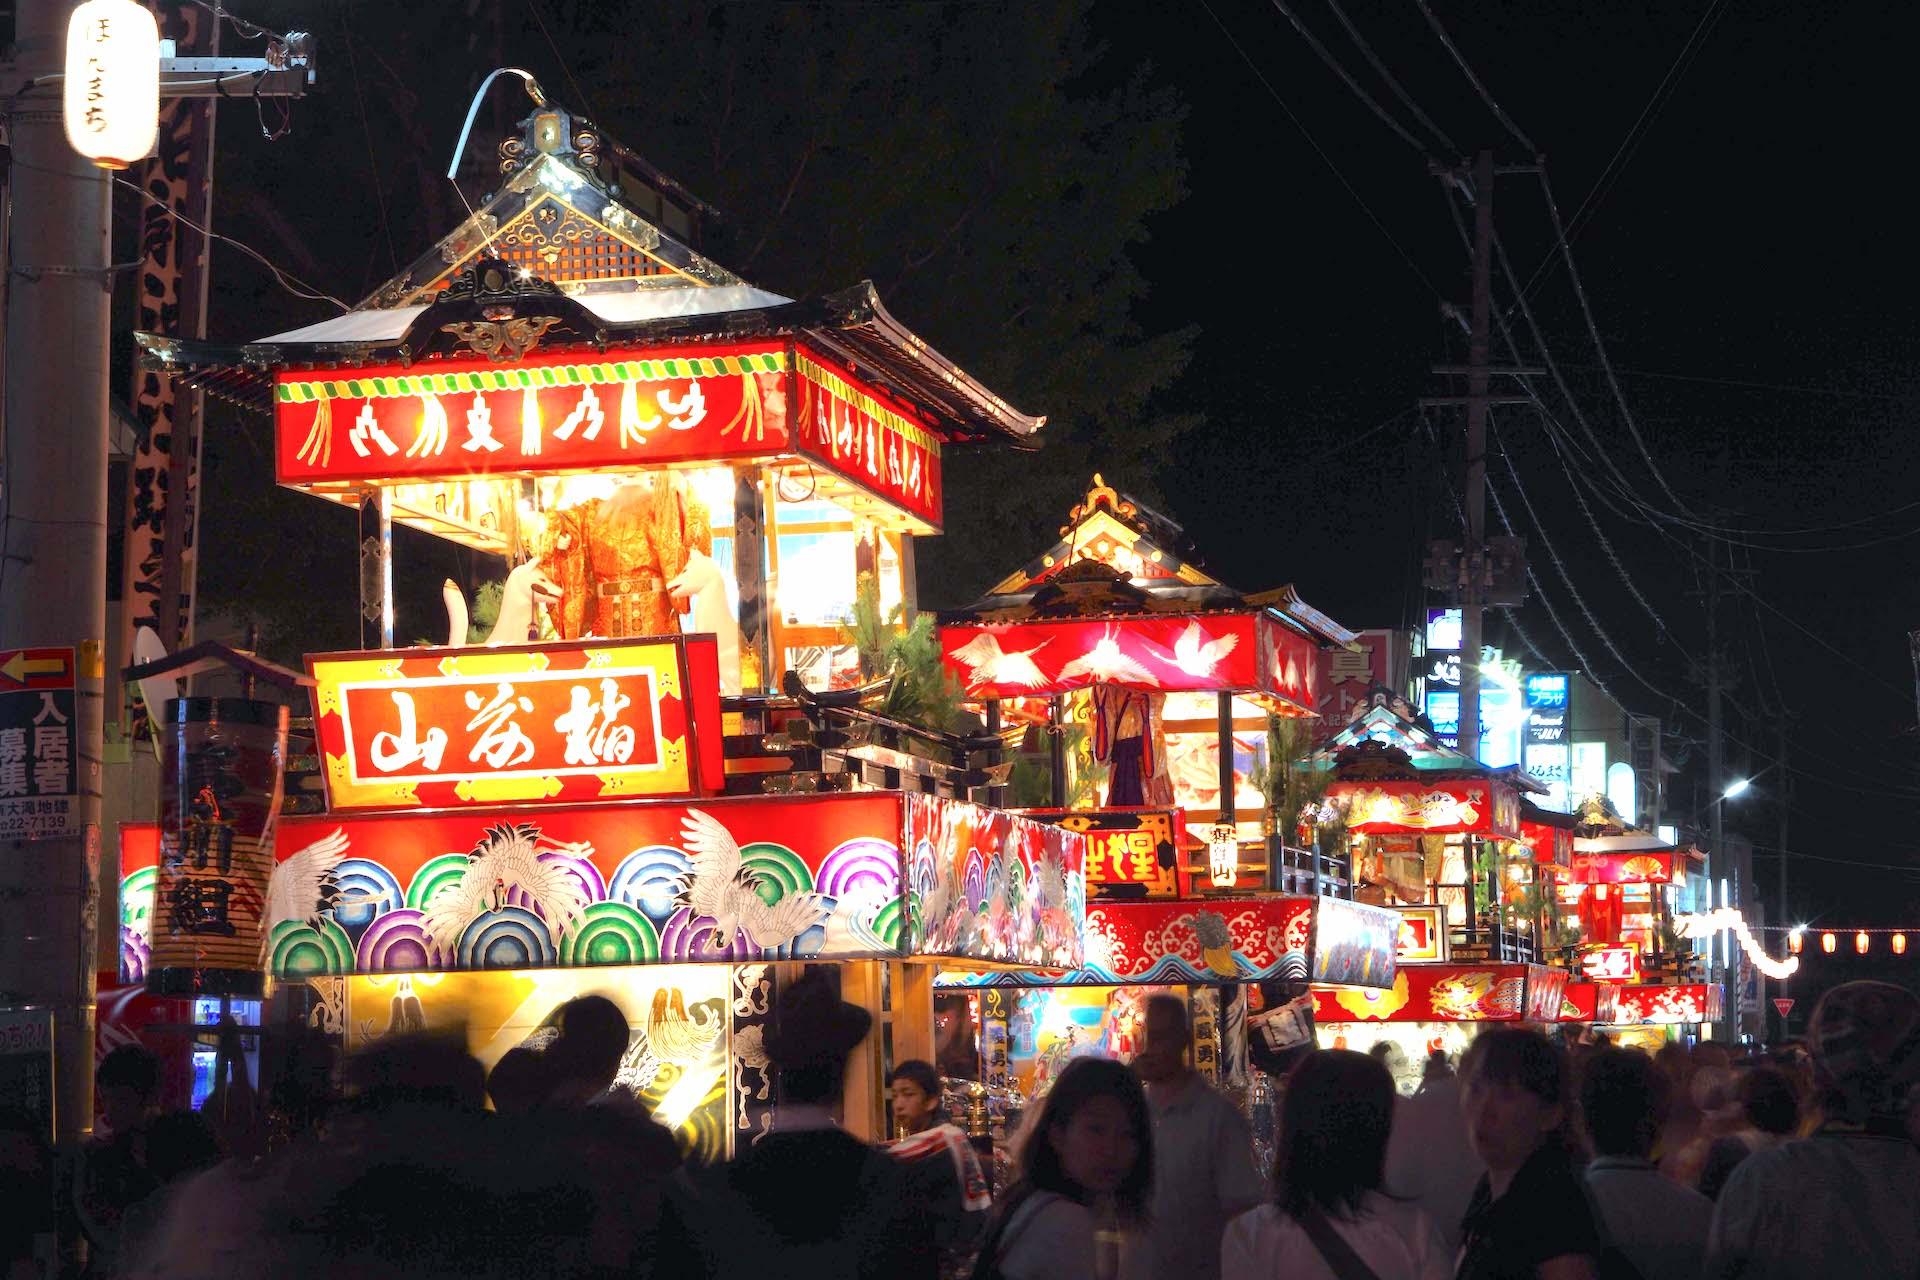 田名部まつり(田名部神社例大祭)